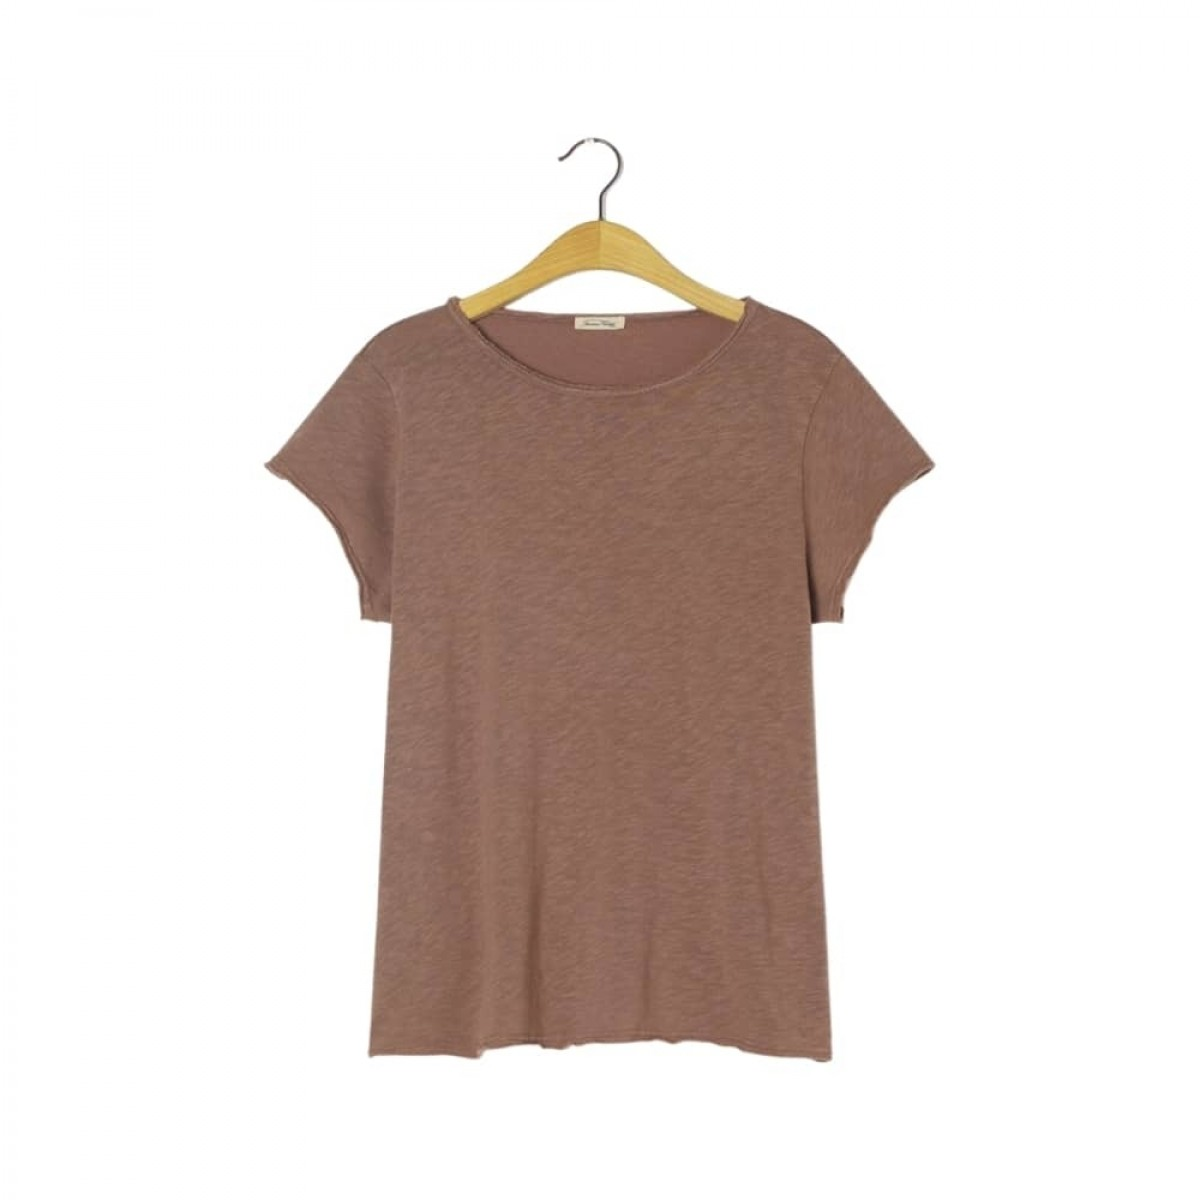 sonoma t-shirt - vintage cocoa